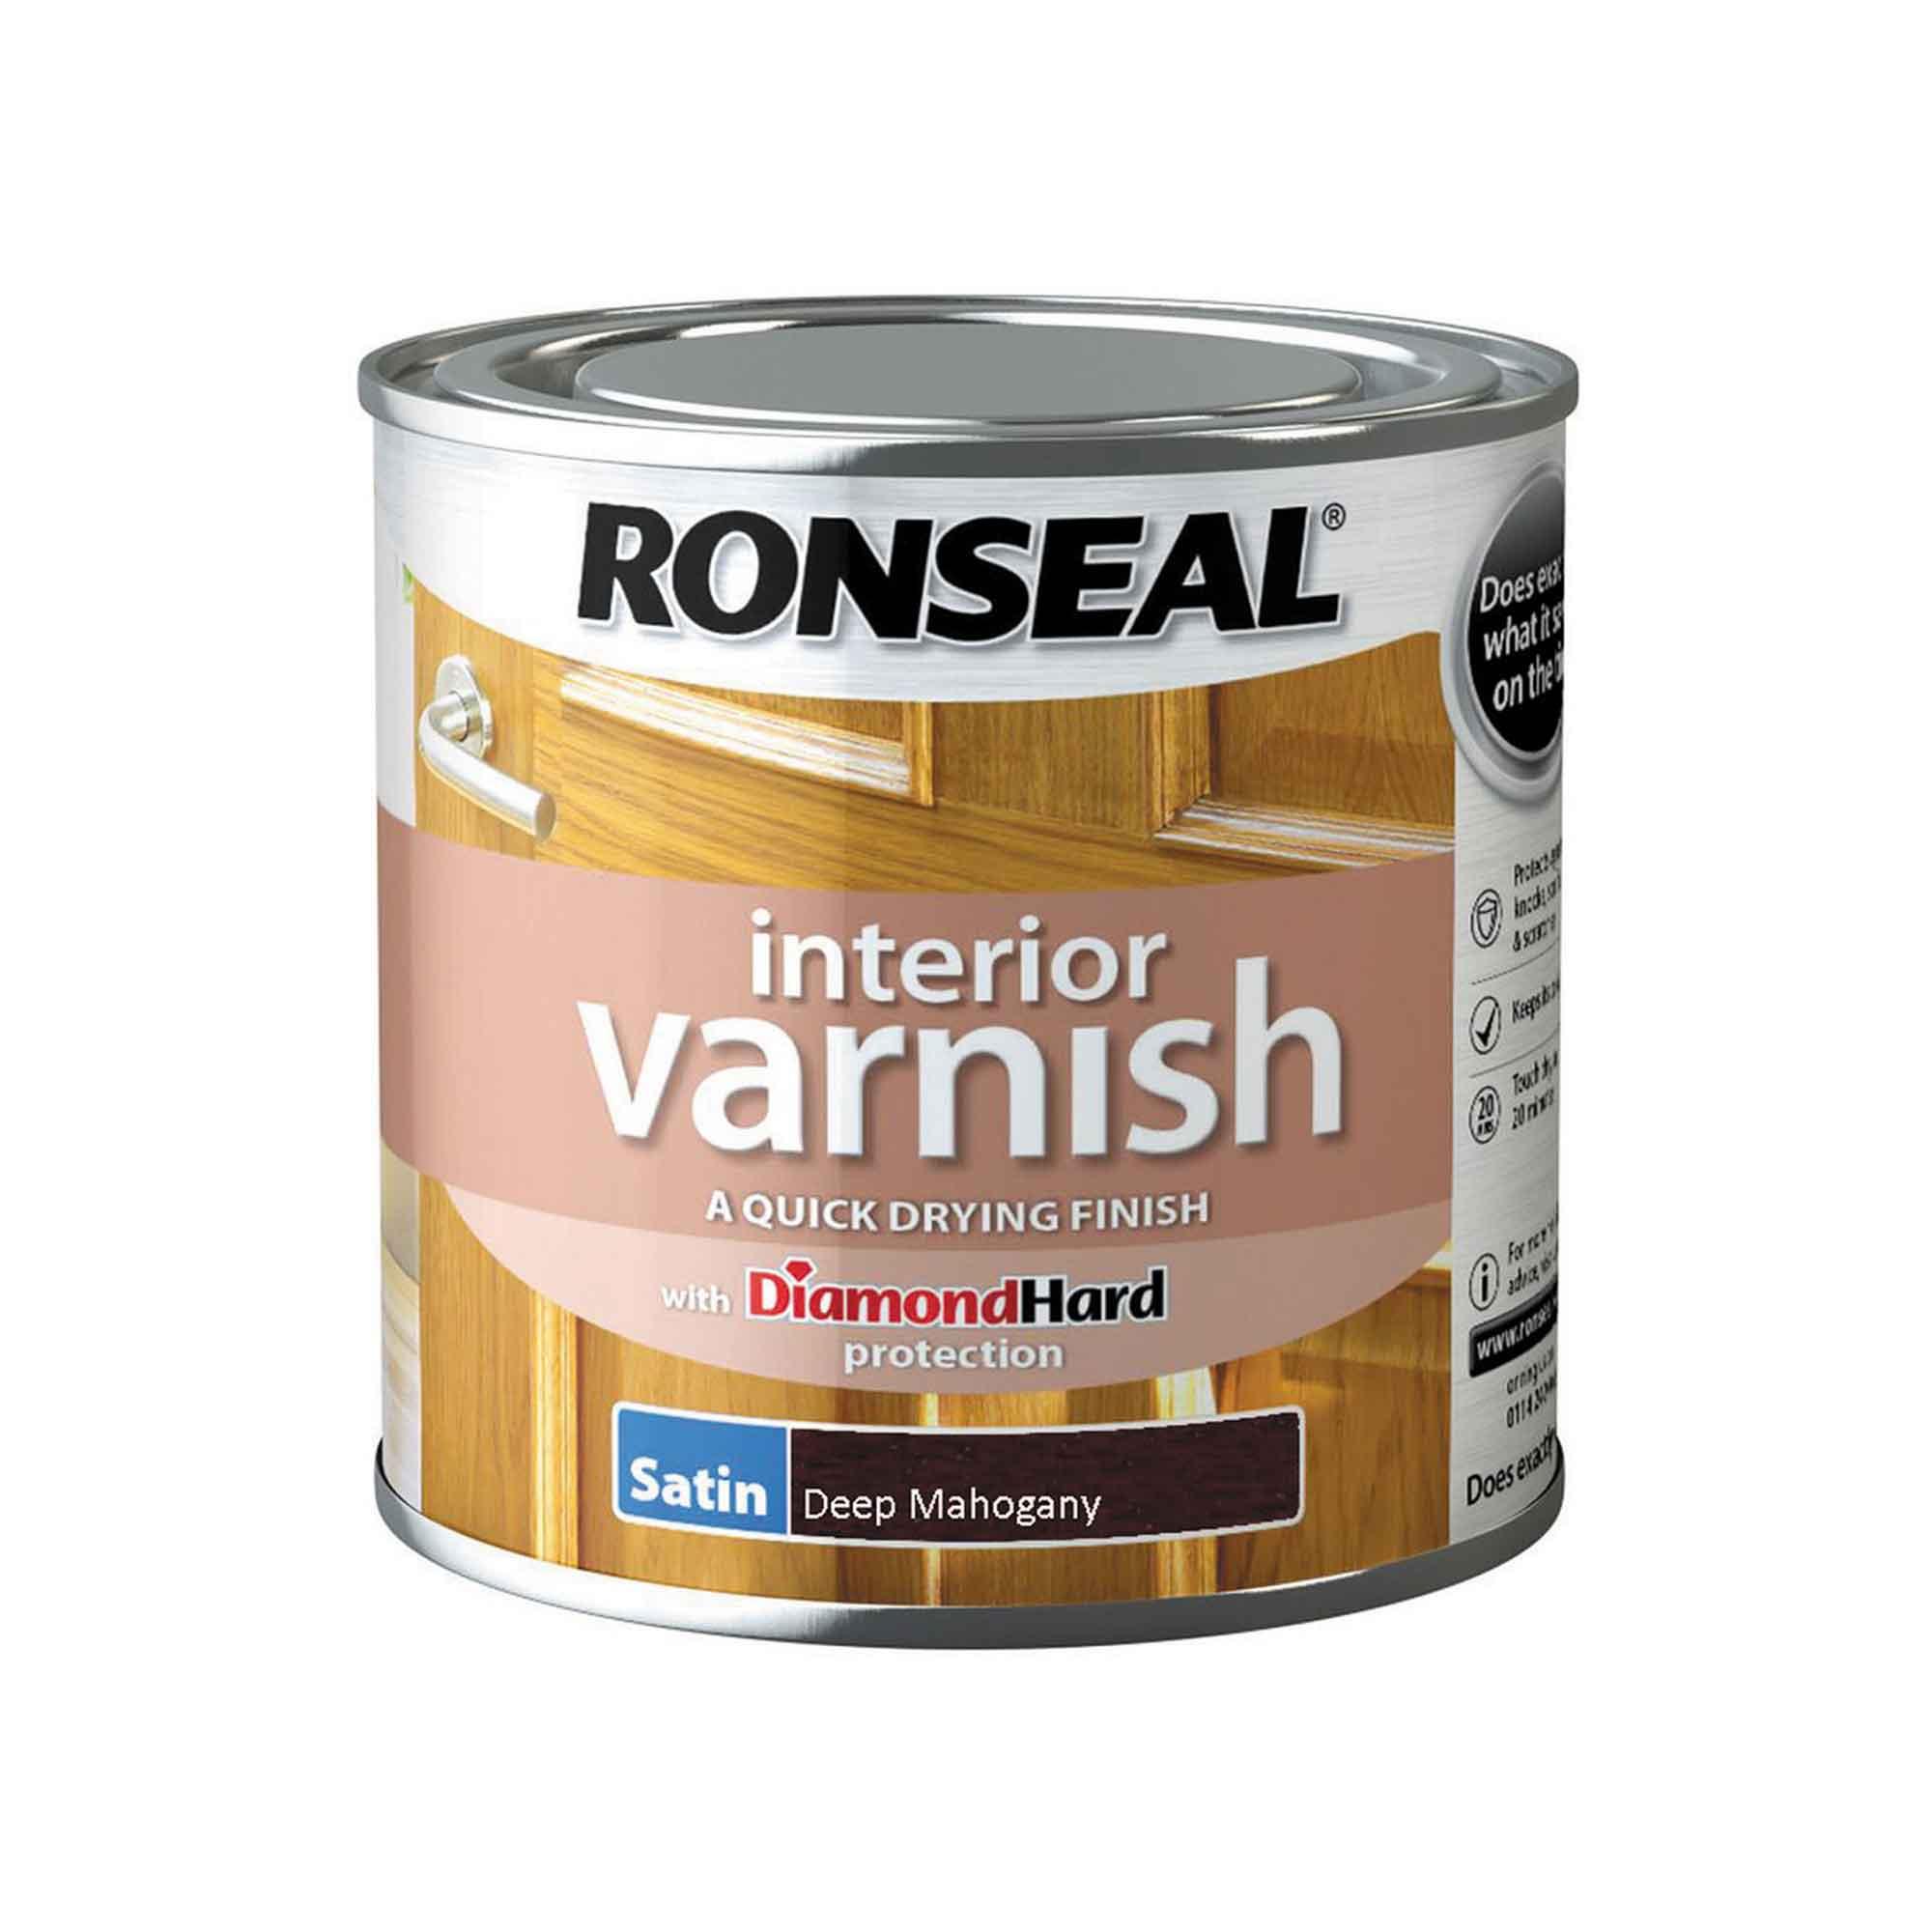 Ronseal Diamond Hard Interior Varnish Satin Deep Mahogany 250ml